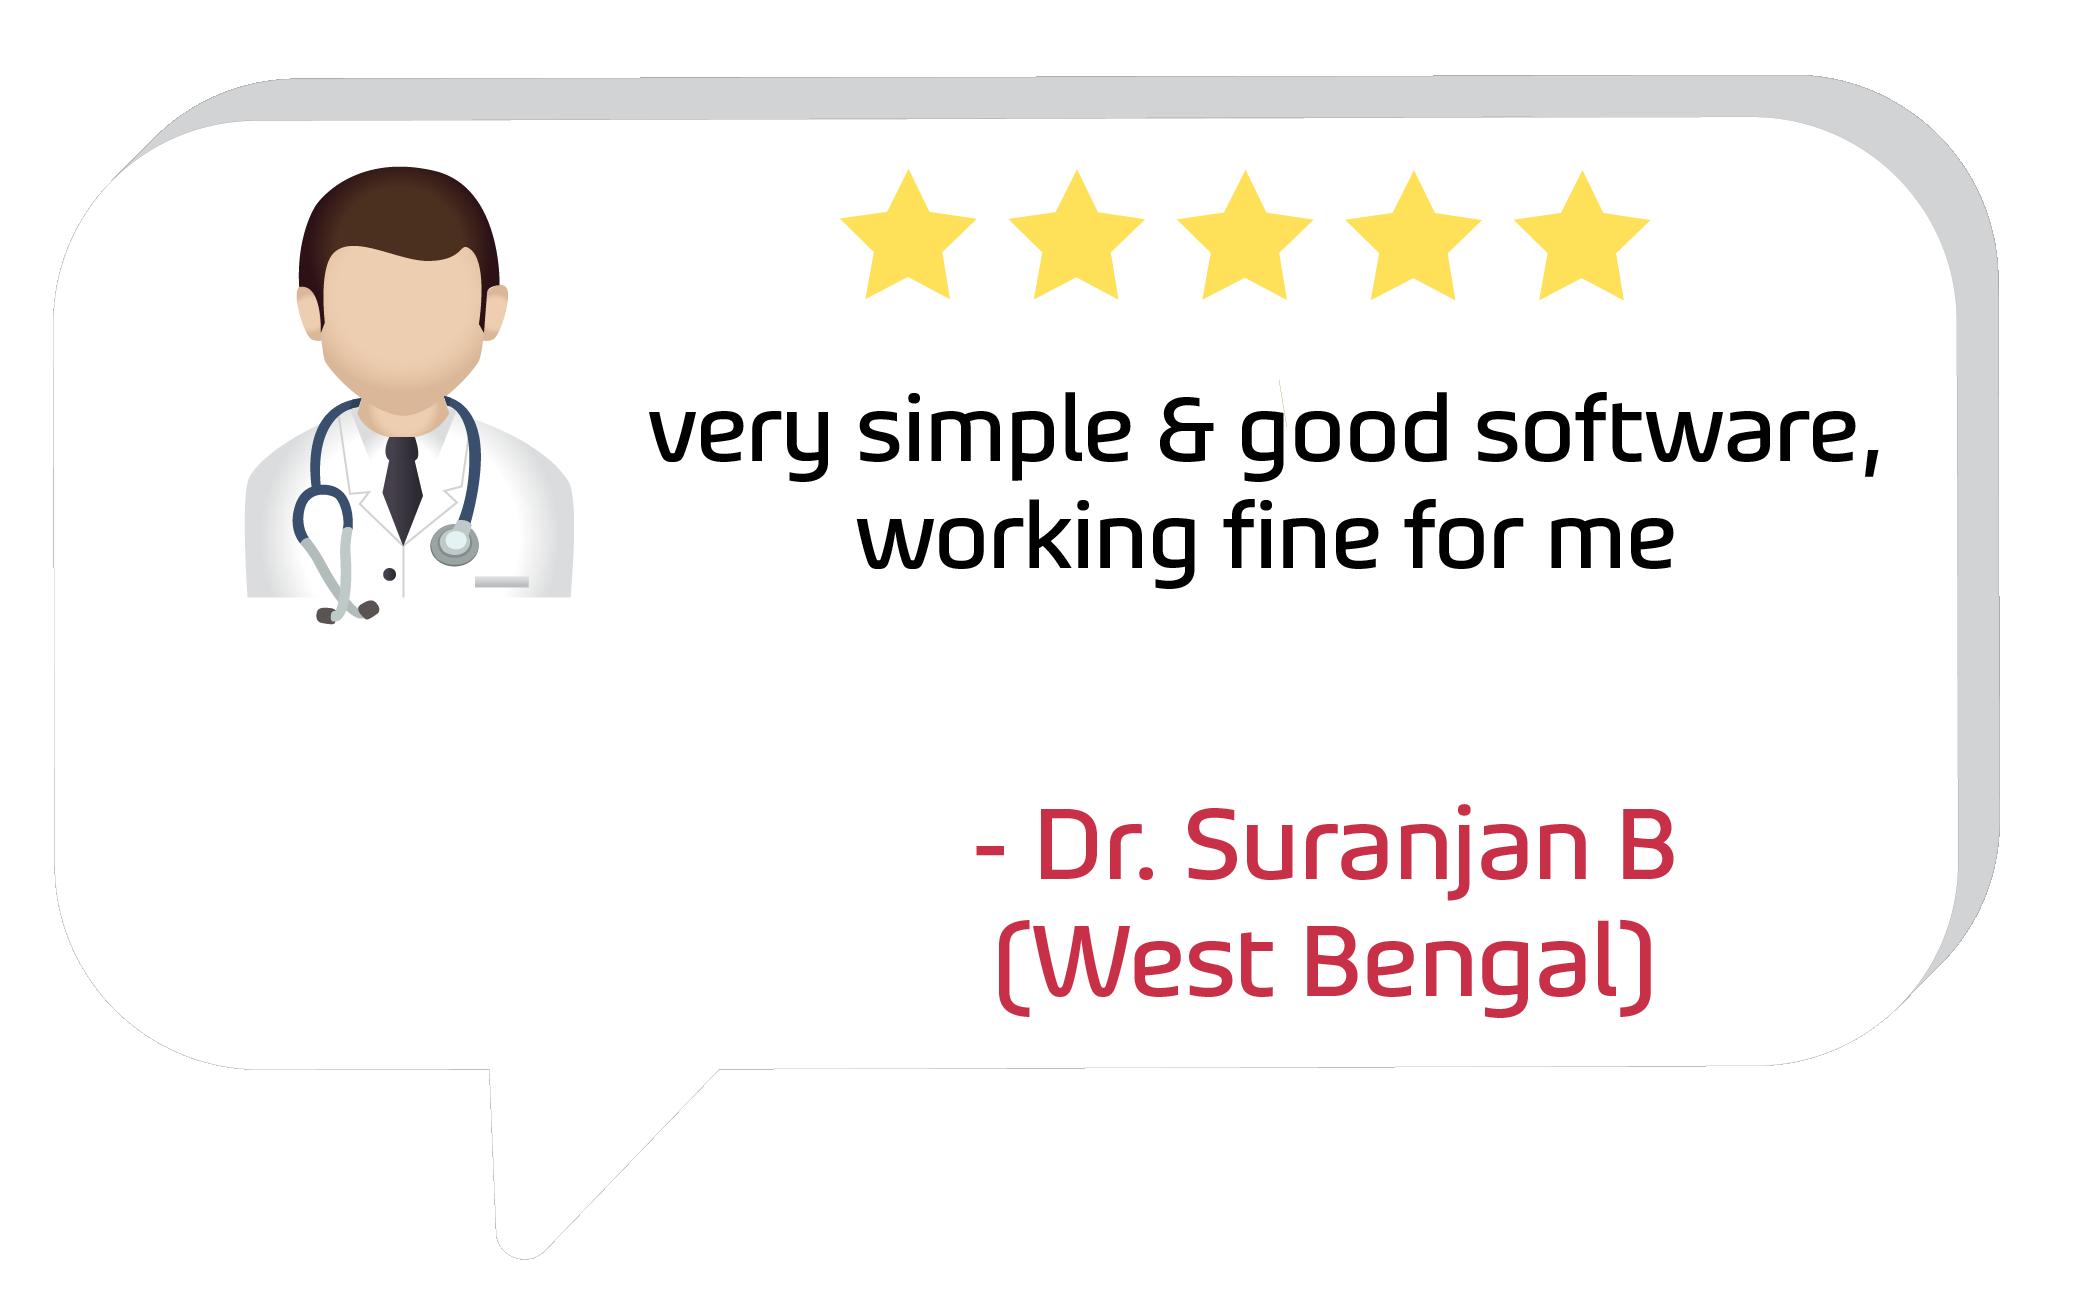 Dr. Suranjan B